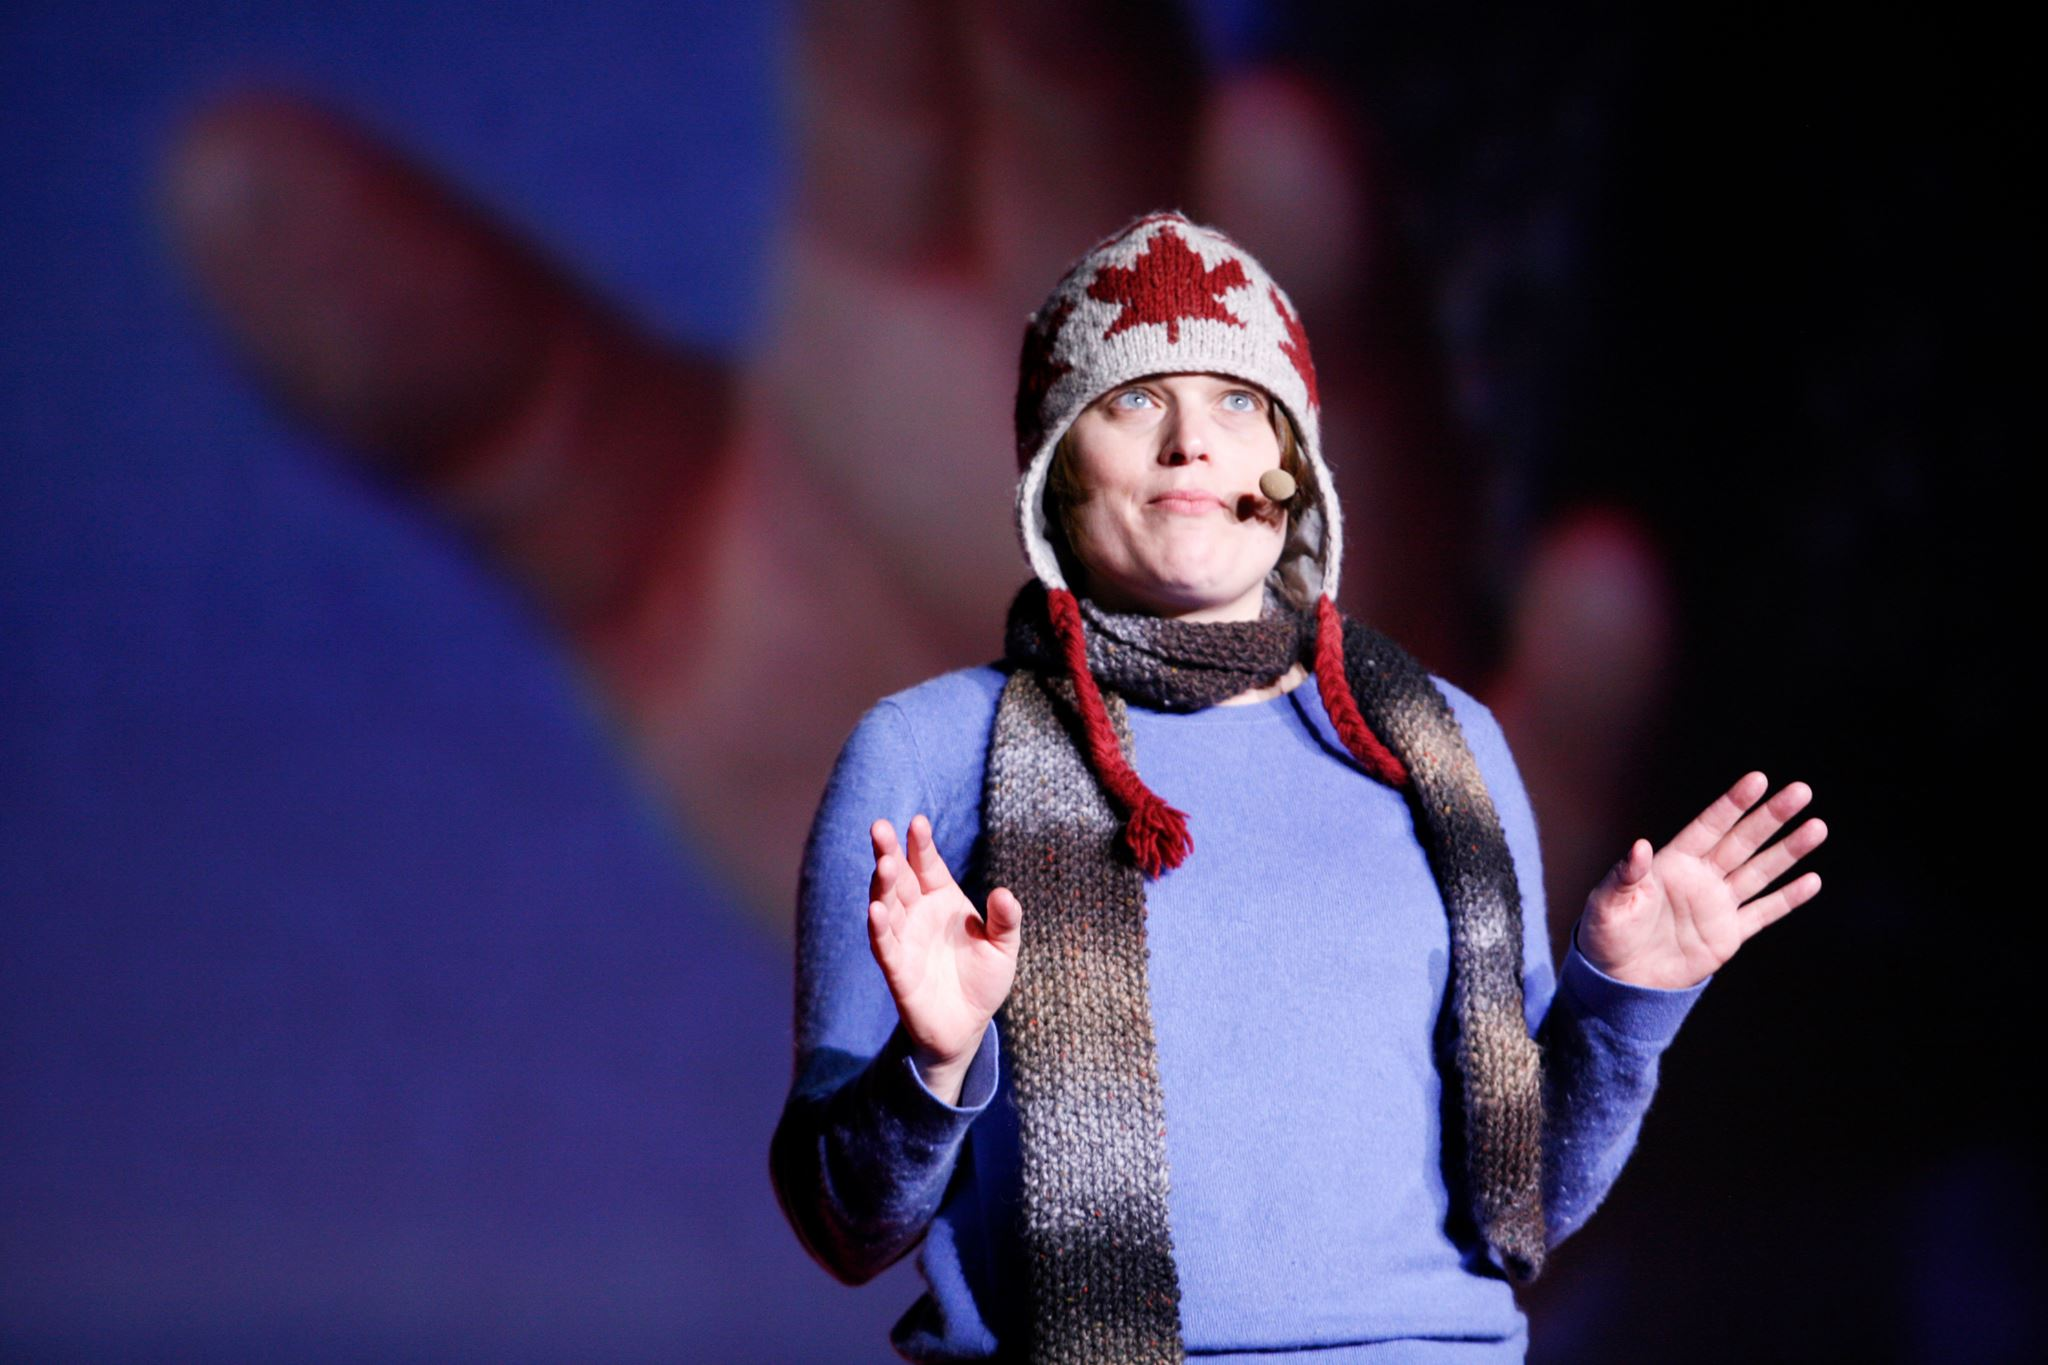 Erica Hargreave speaking at TEDxWarsaw